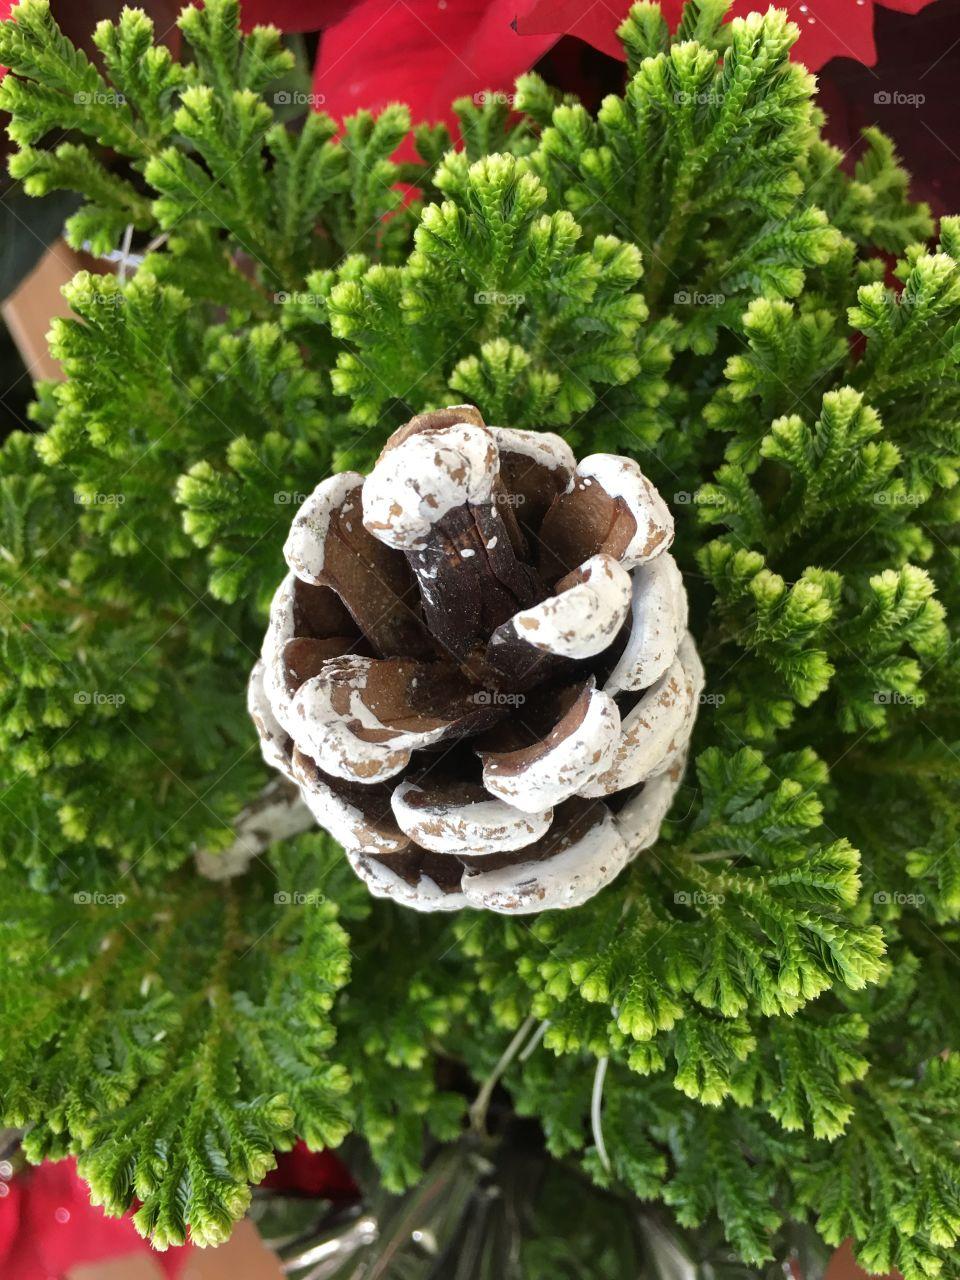 Pine cone, pine, plant, green, craft, holiday, bouquet, decoration, decor, Christmas, no person, outdoor, closeup, evergreen